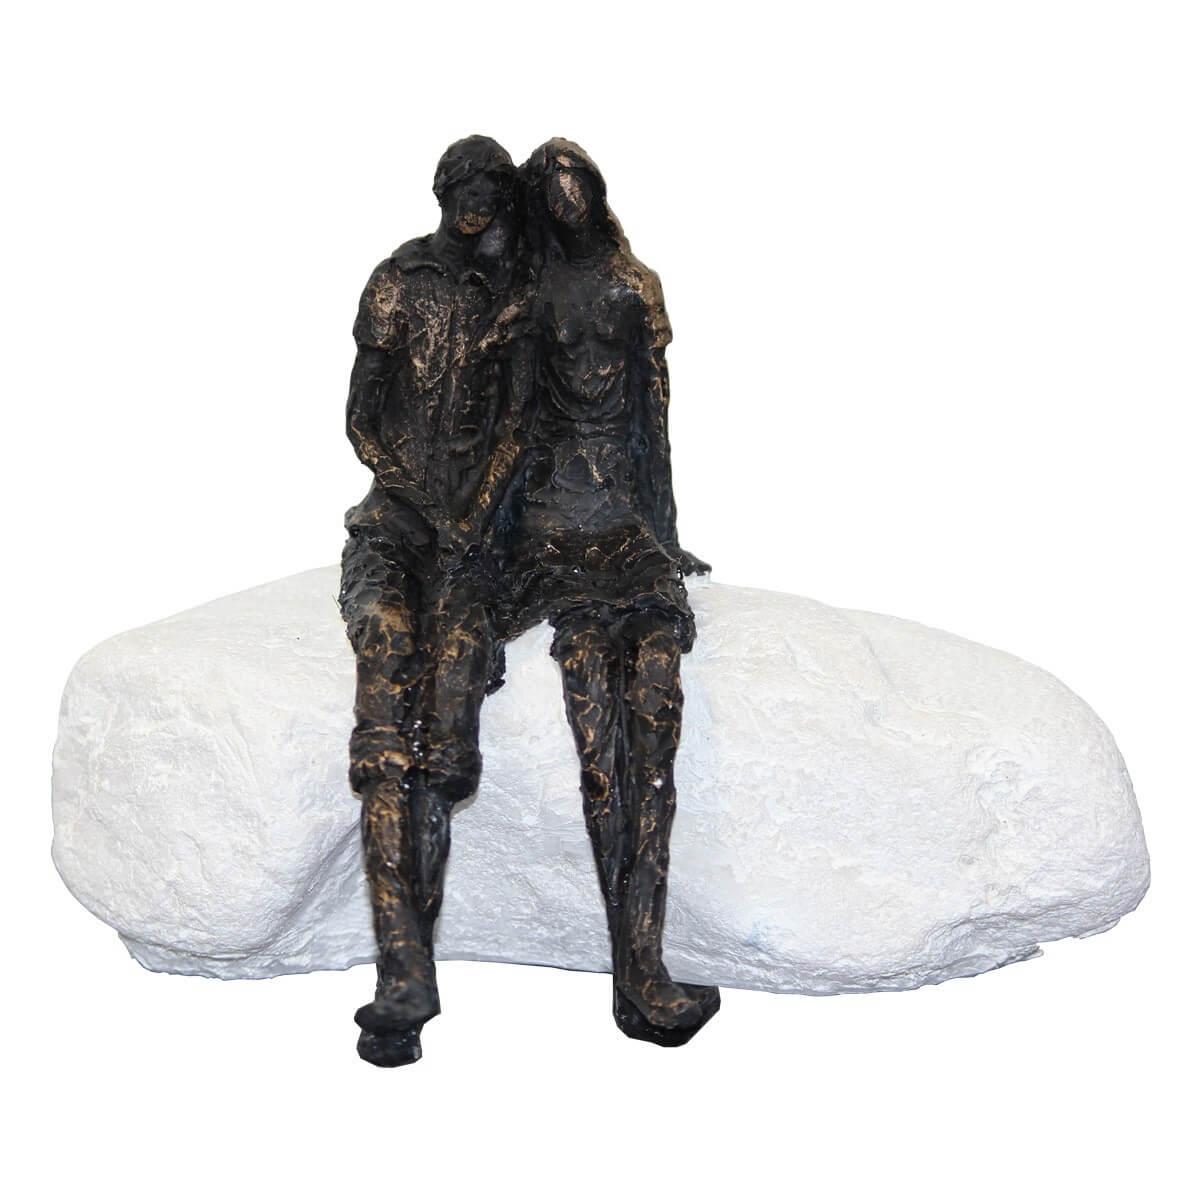 Deko Skulptur Creme / Schwarz